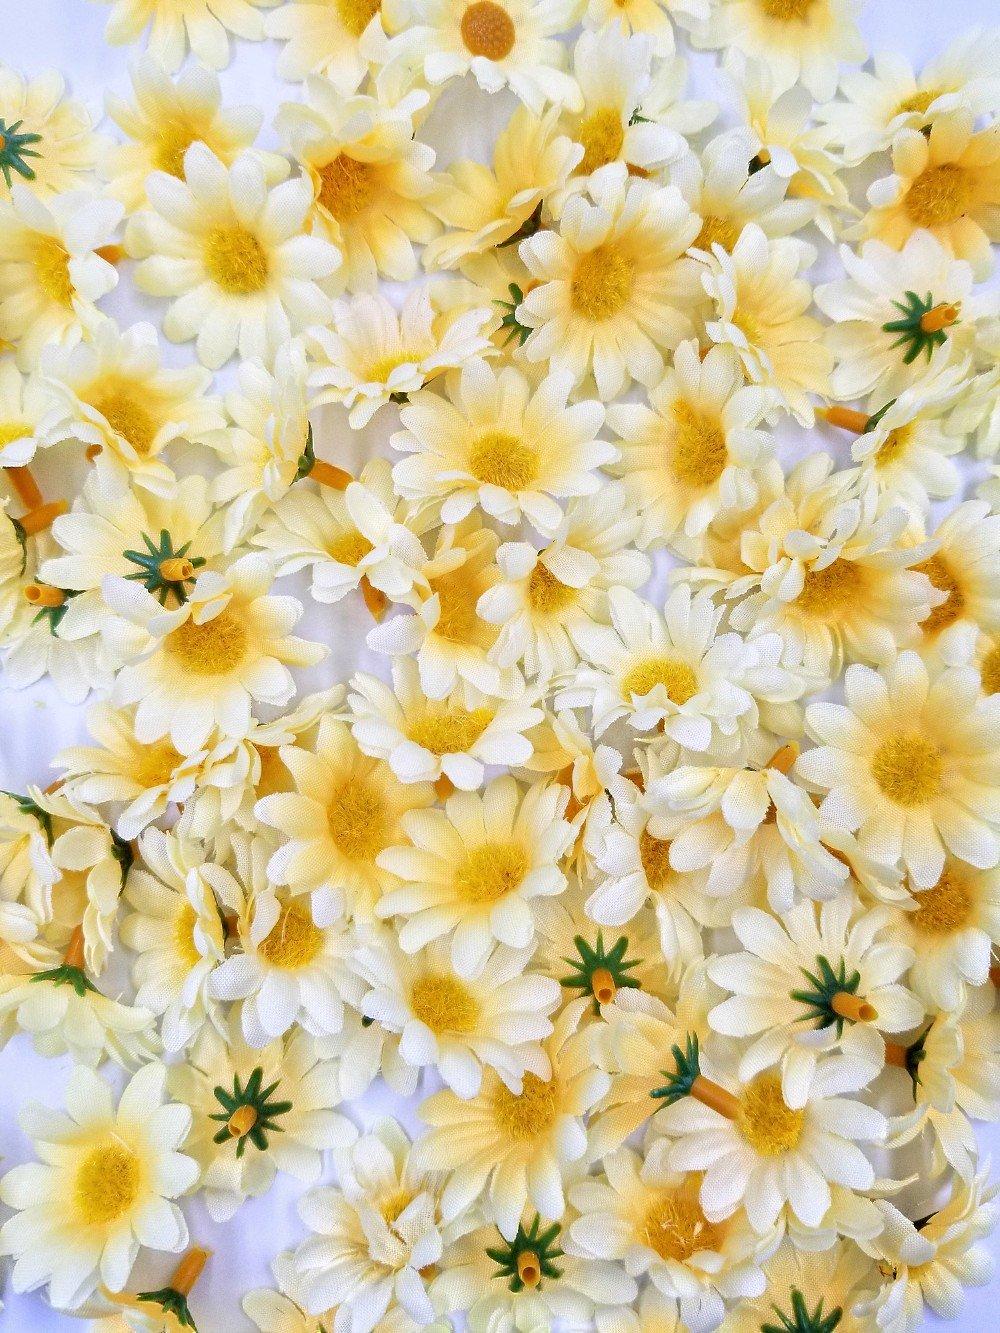 JZK 100 x Amarillo margaritas artificiales gerbera margaritas flores cabezas para manualidades boda navidad decoracion…